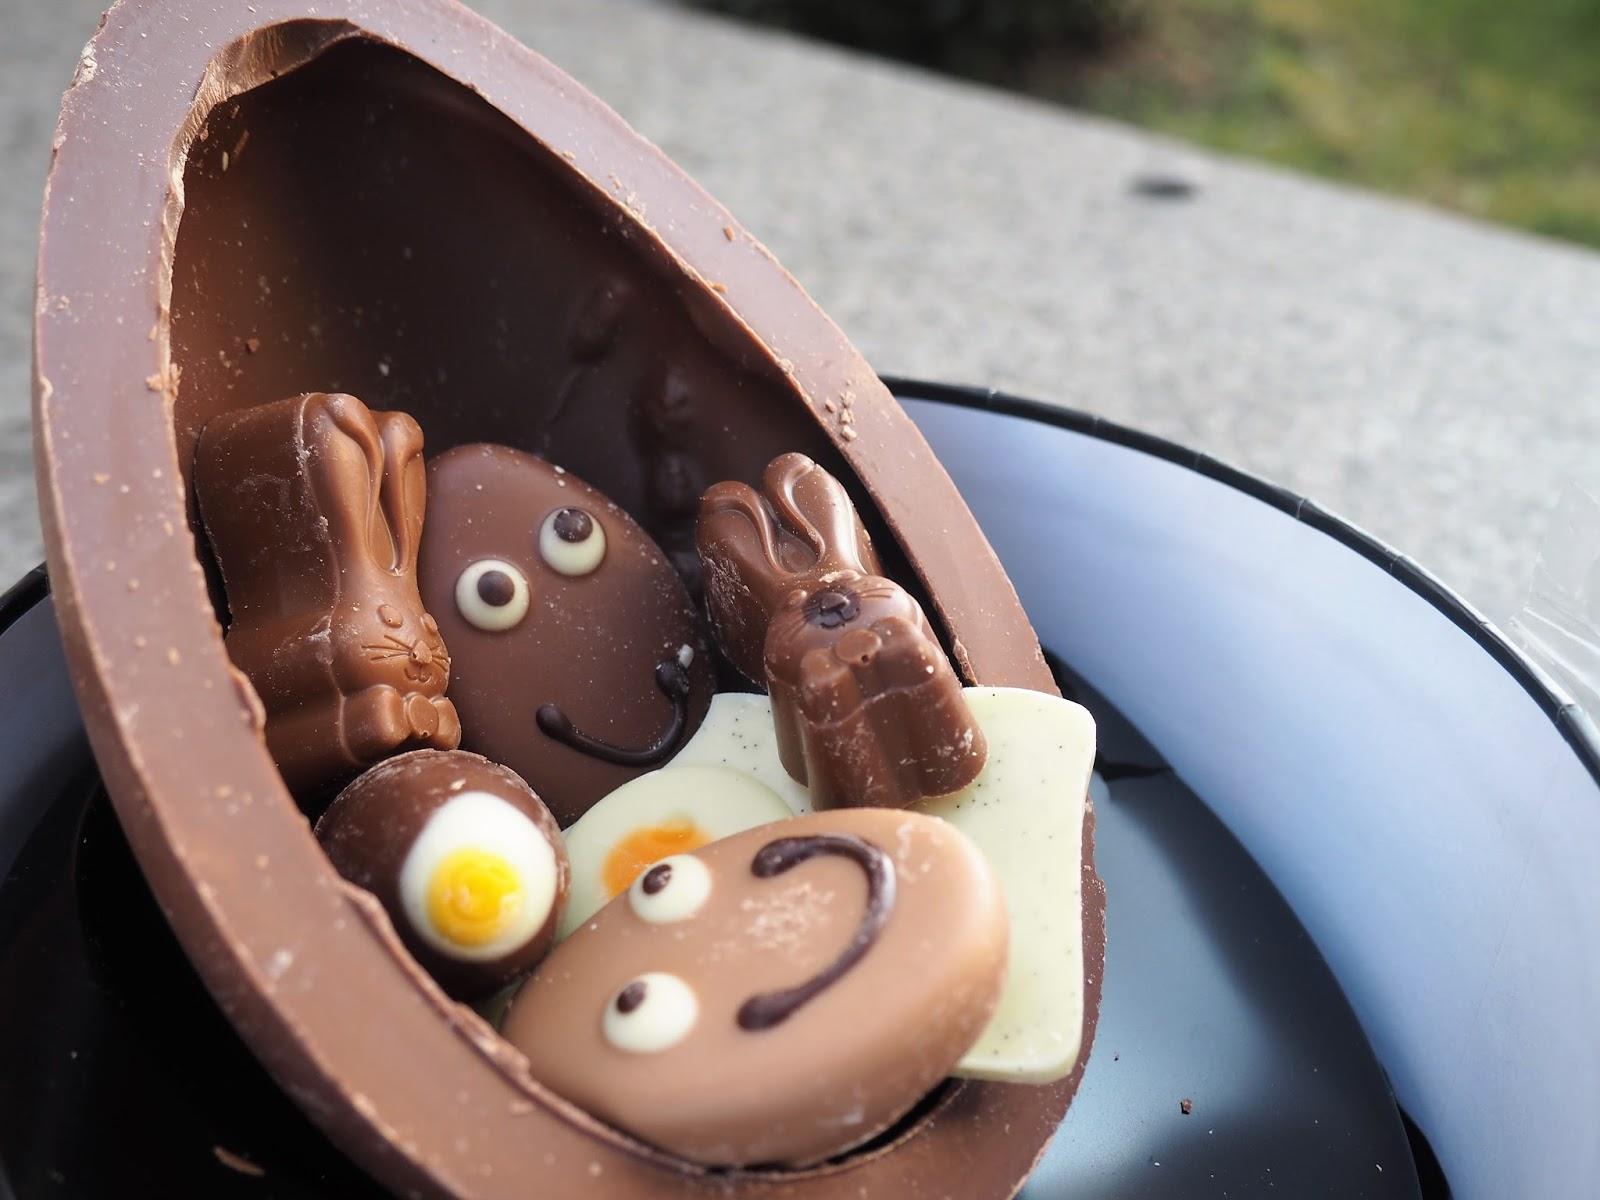 Hotel Chocolat You Crack Me Up Easter Egg